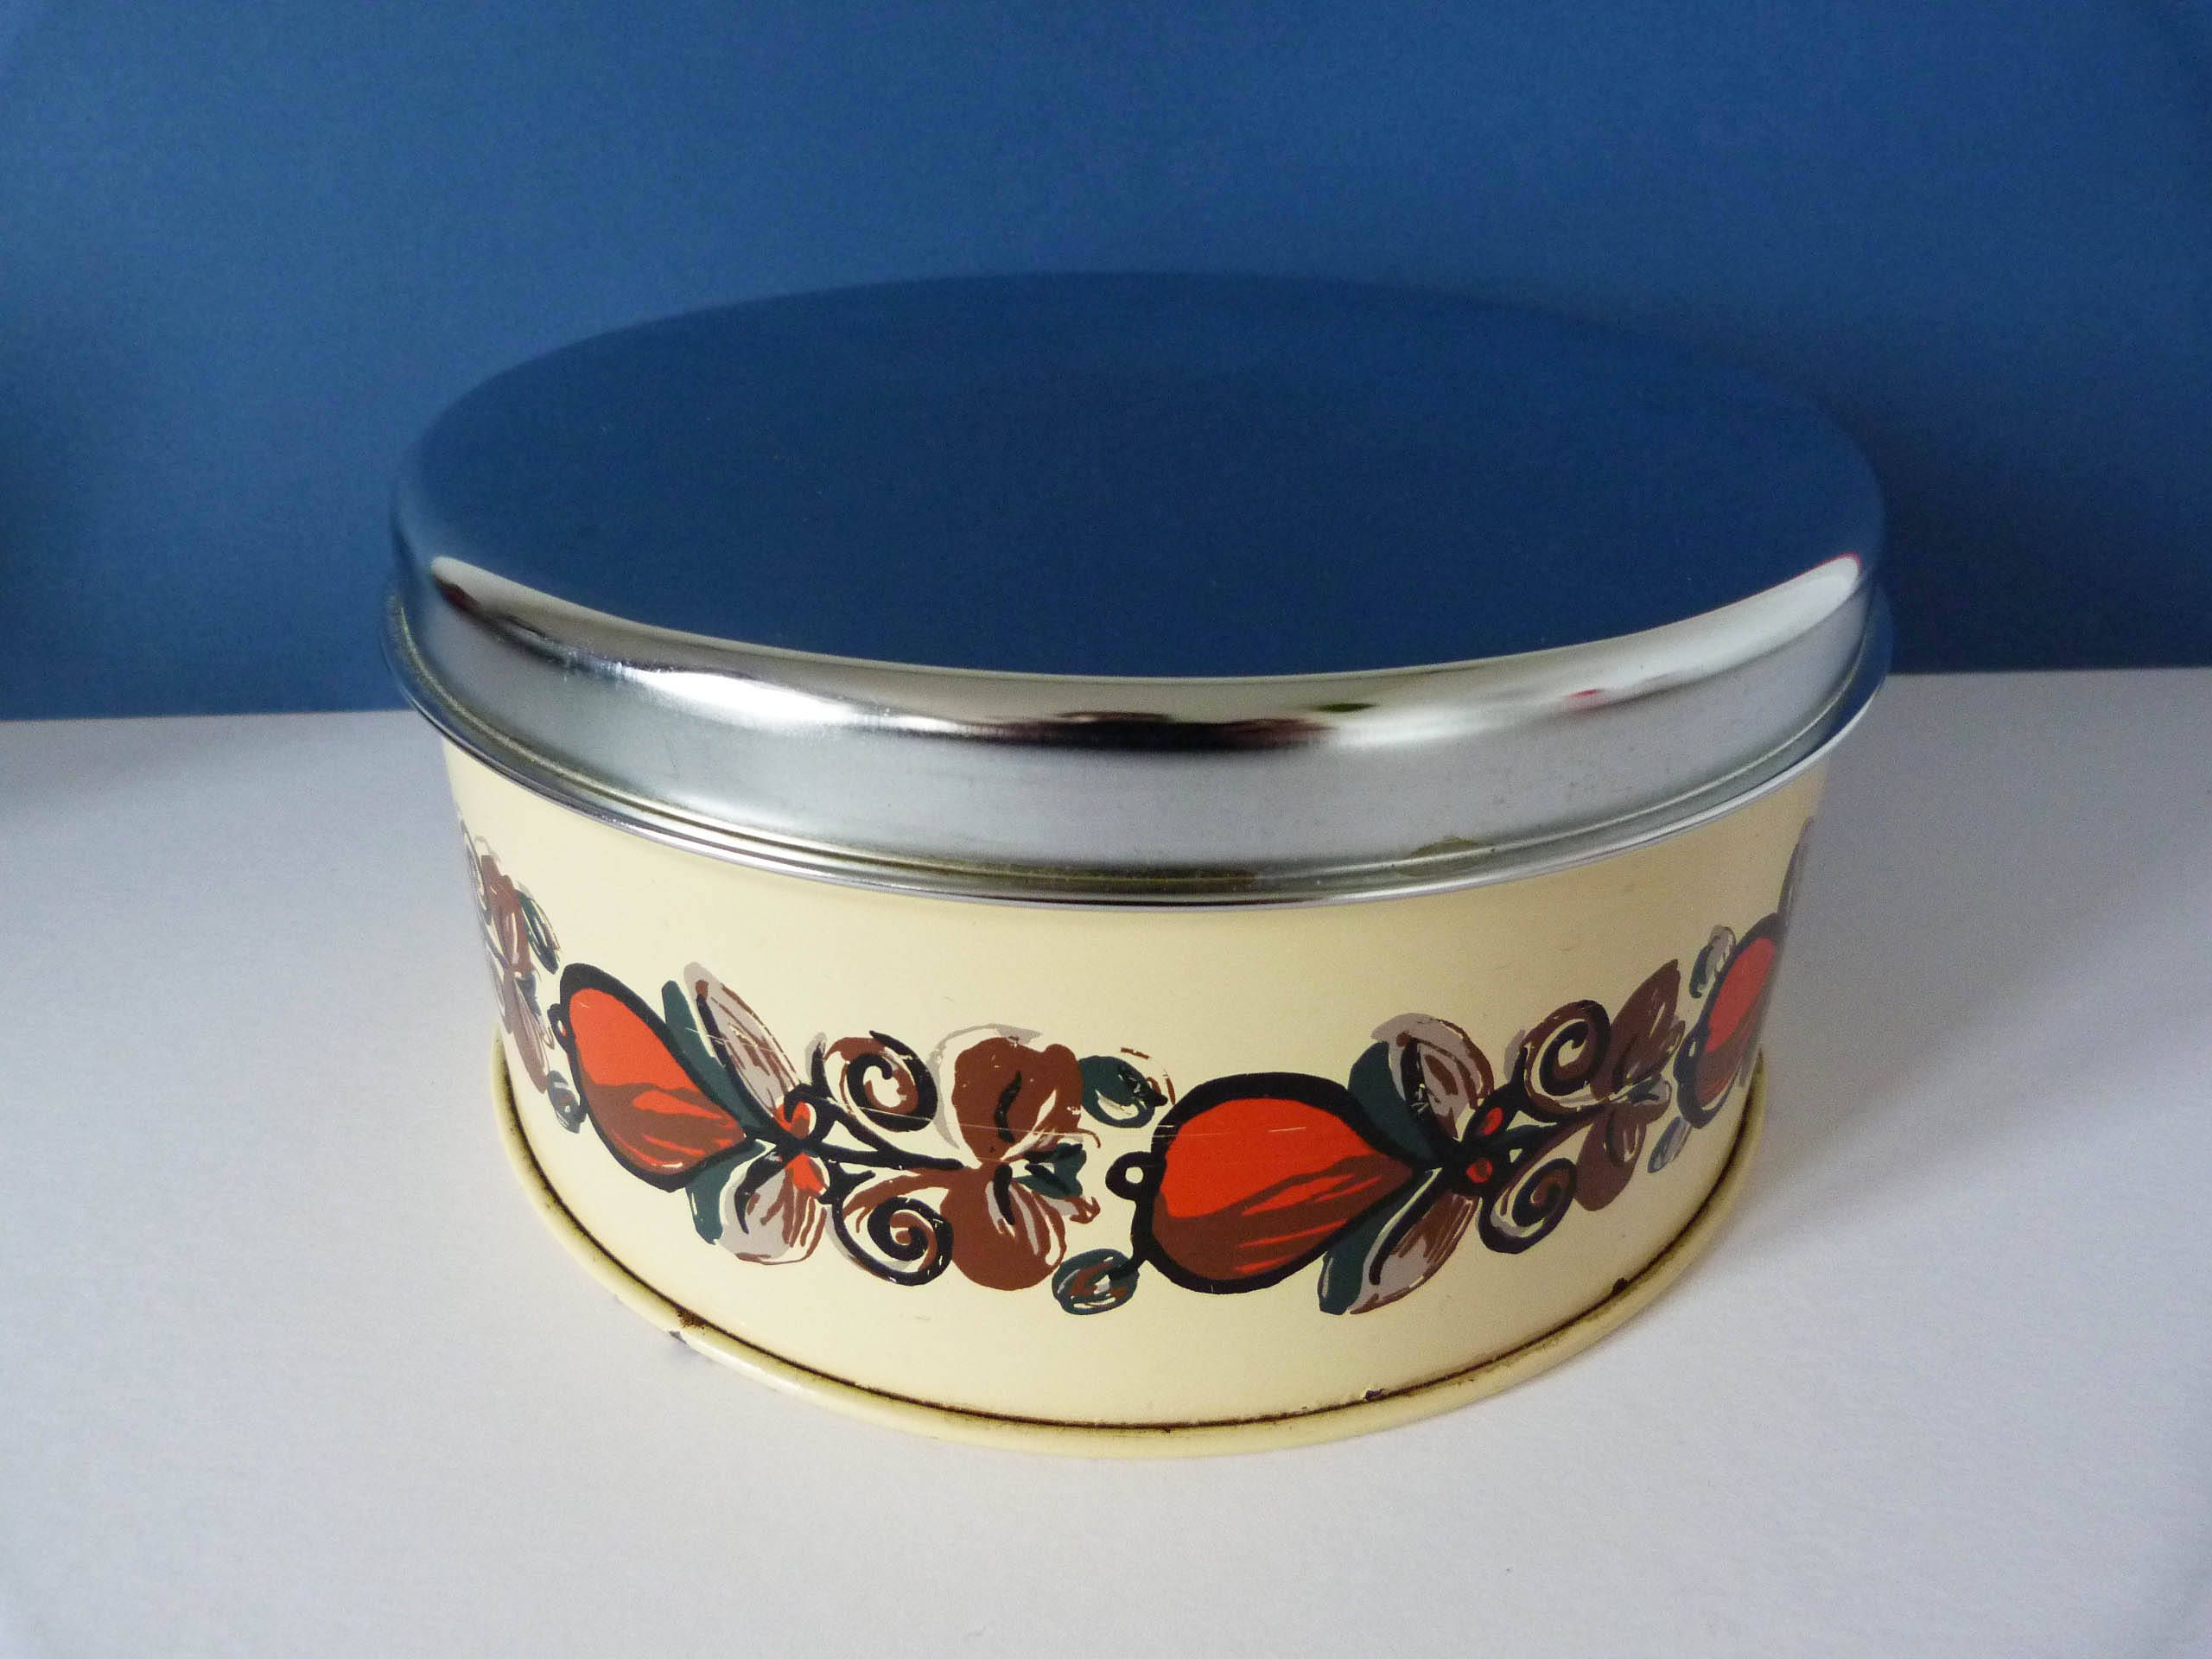 image vintage kitchen craft ideas. Vintage Image Kitchen Craft Ideas